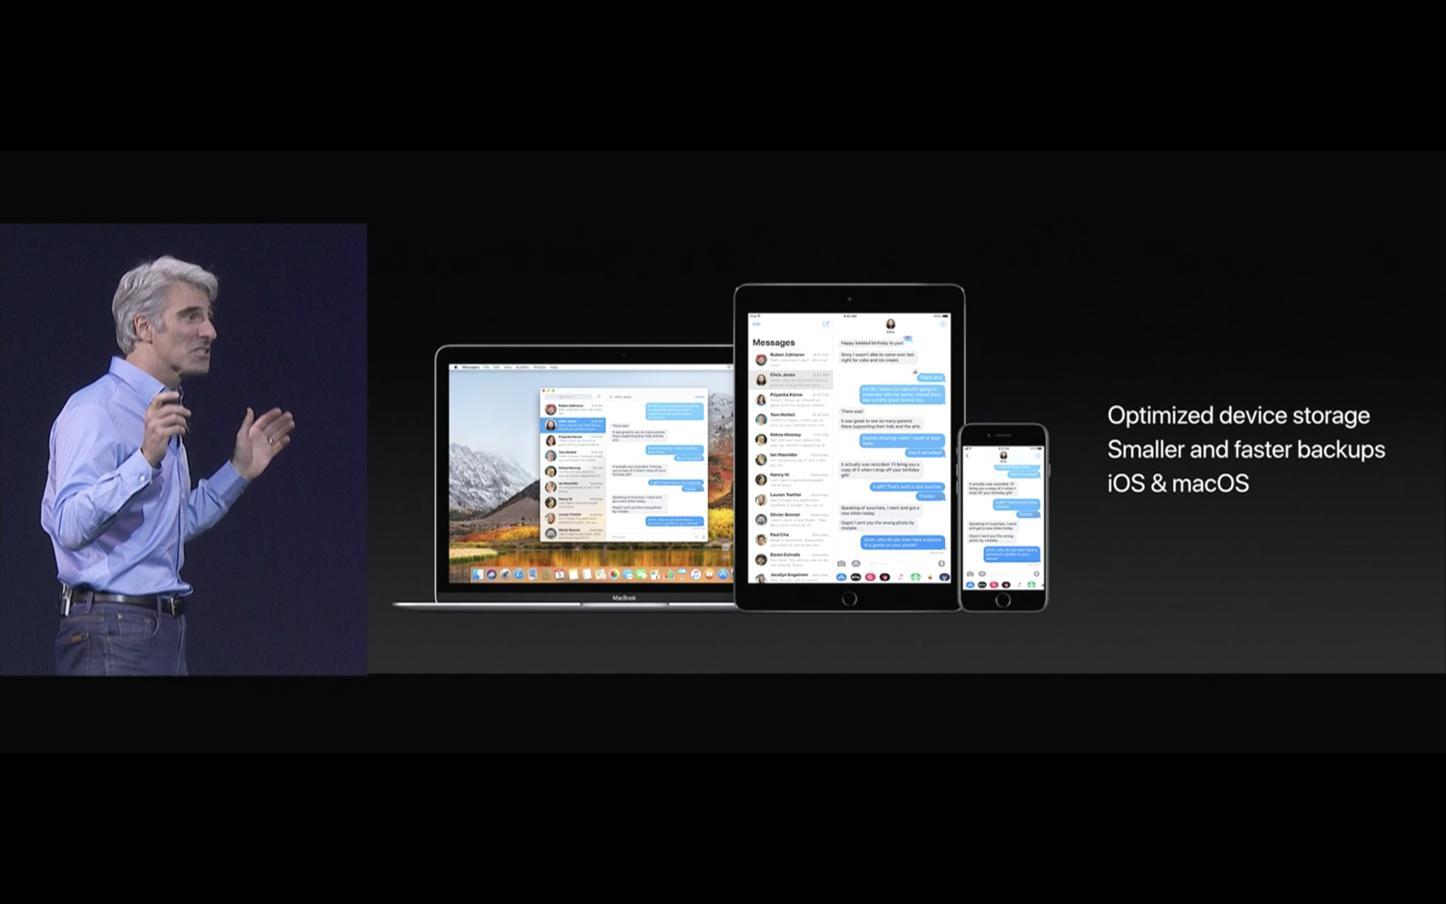 iOS11-2017-WWDC17-04.png